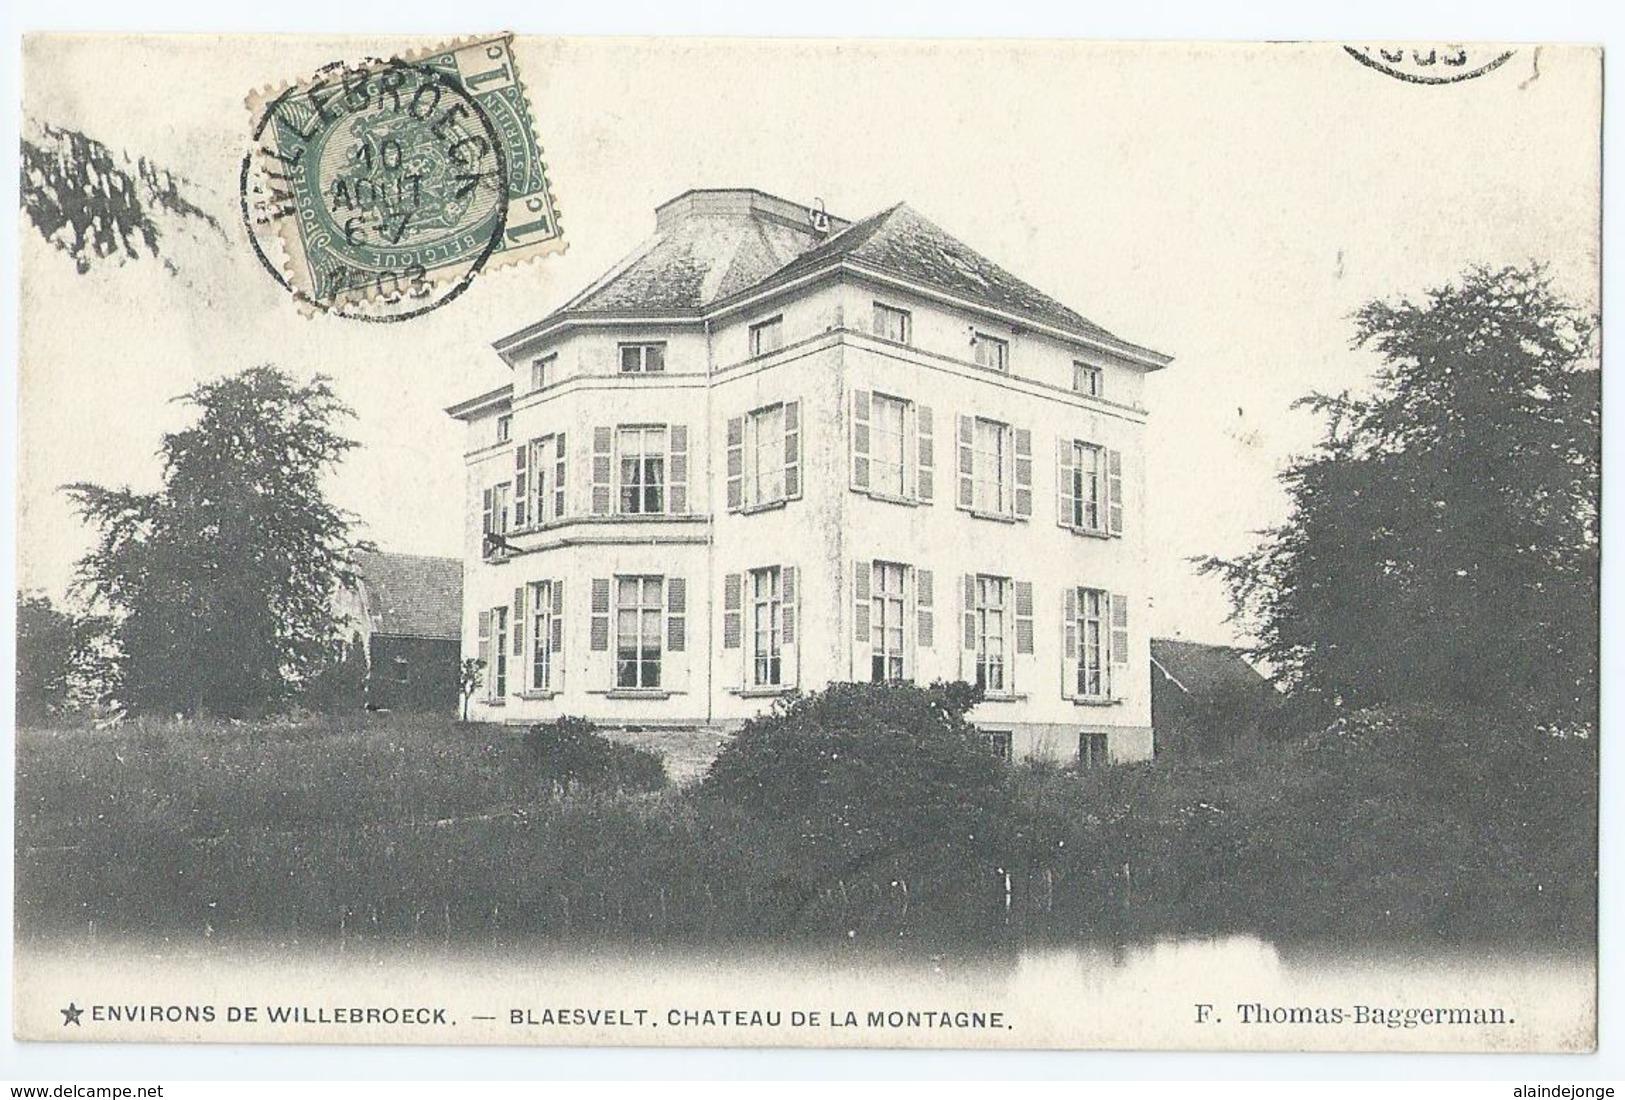 Willebroek - Blaesvelt - Château De La Montagne - Environs De Willebroeck - F. Thomas-Baggerman - 1903 - Willebroek